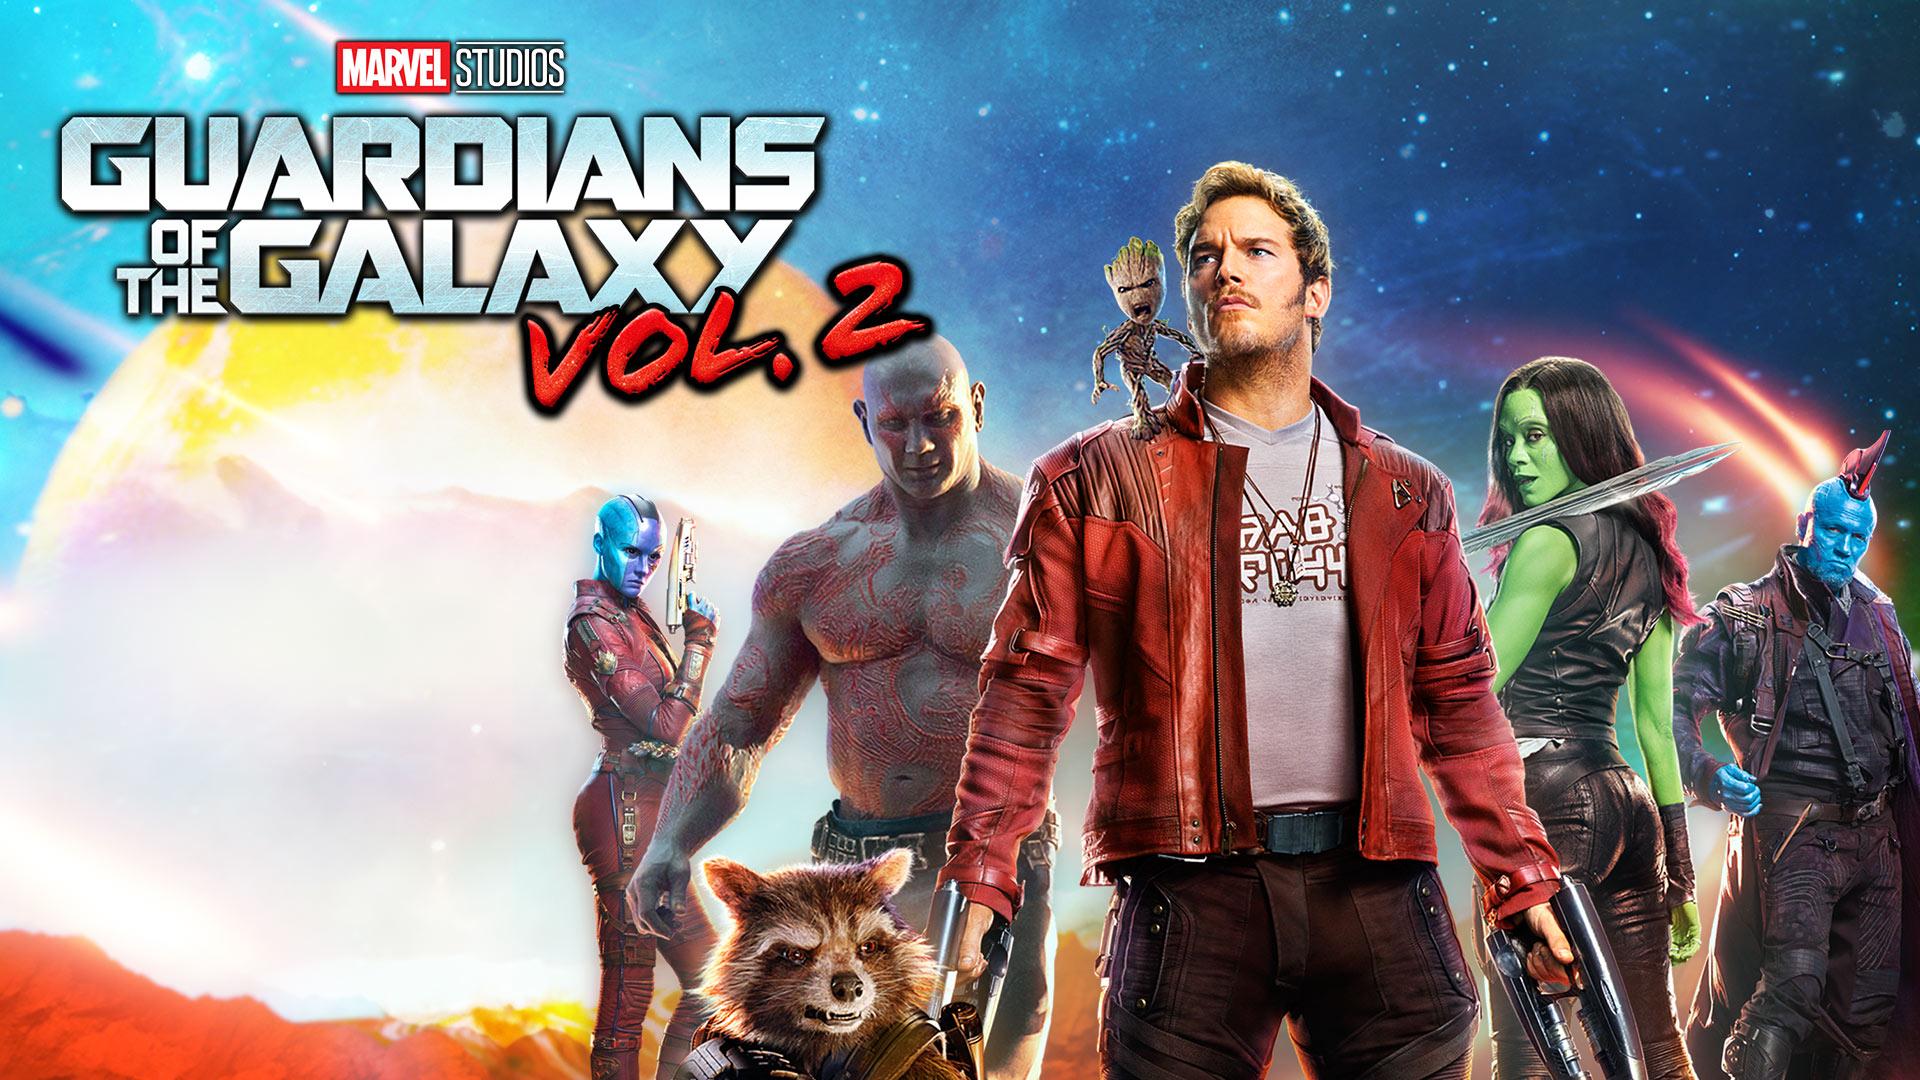 Marvel Studios' Guardians of the Galaxy Vol. 2 (4K UHD)